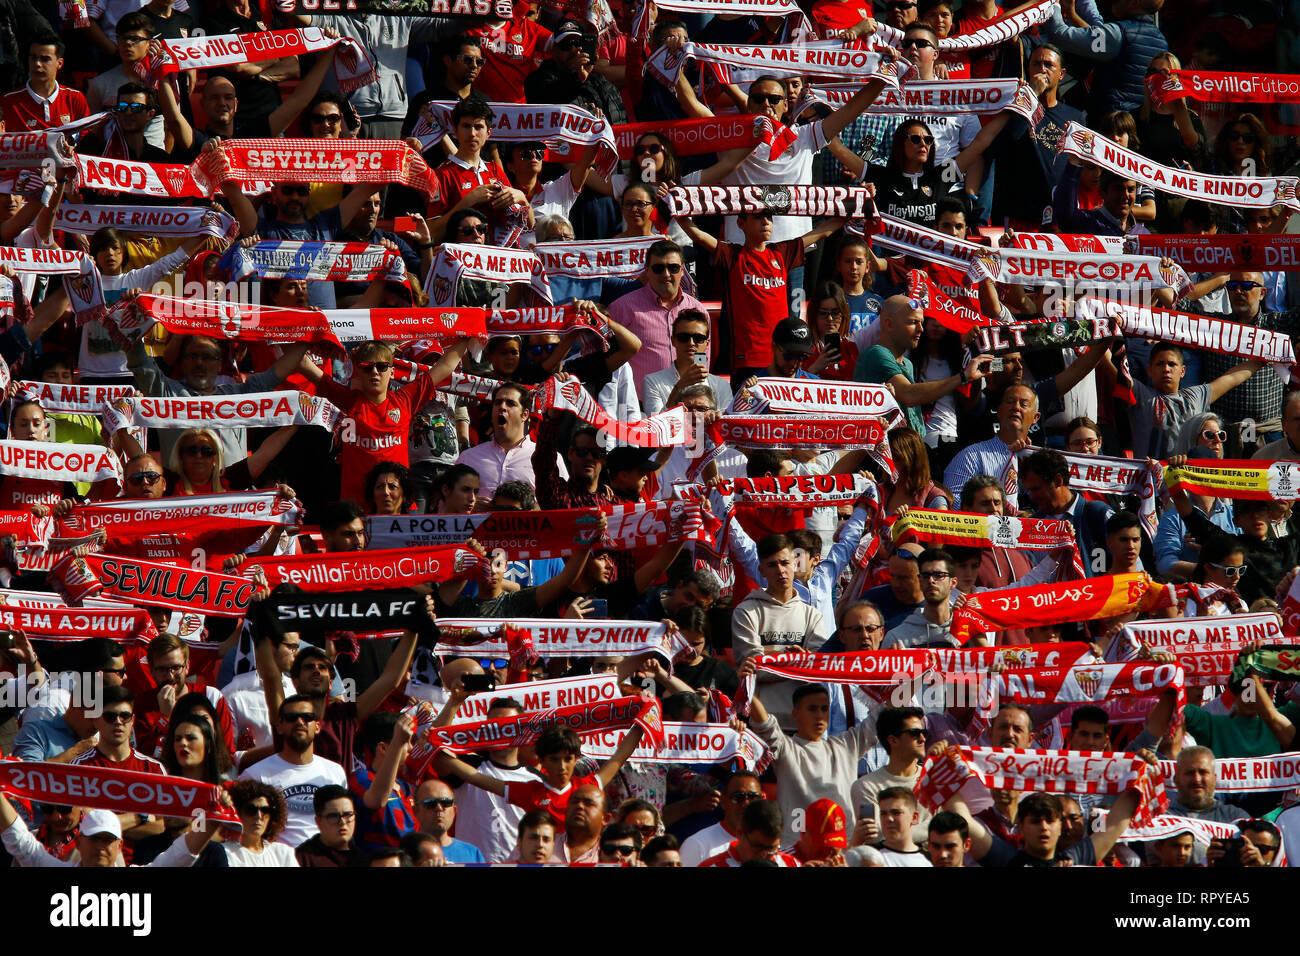 Sevilla FC fans are seen during the La Liga match between Sevilla FC and Futbol Club Barcelona at Estadio Sanchez Pizjuan in Seville, Spain. ( Final score; Sevilla FC 2:4 Futbol Club Barcelona ) - Stock Image